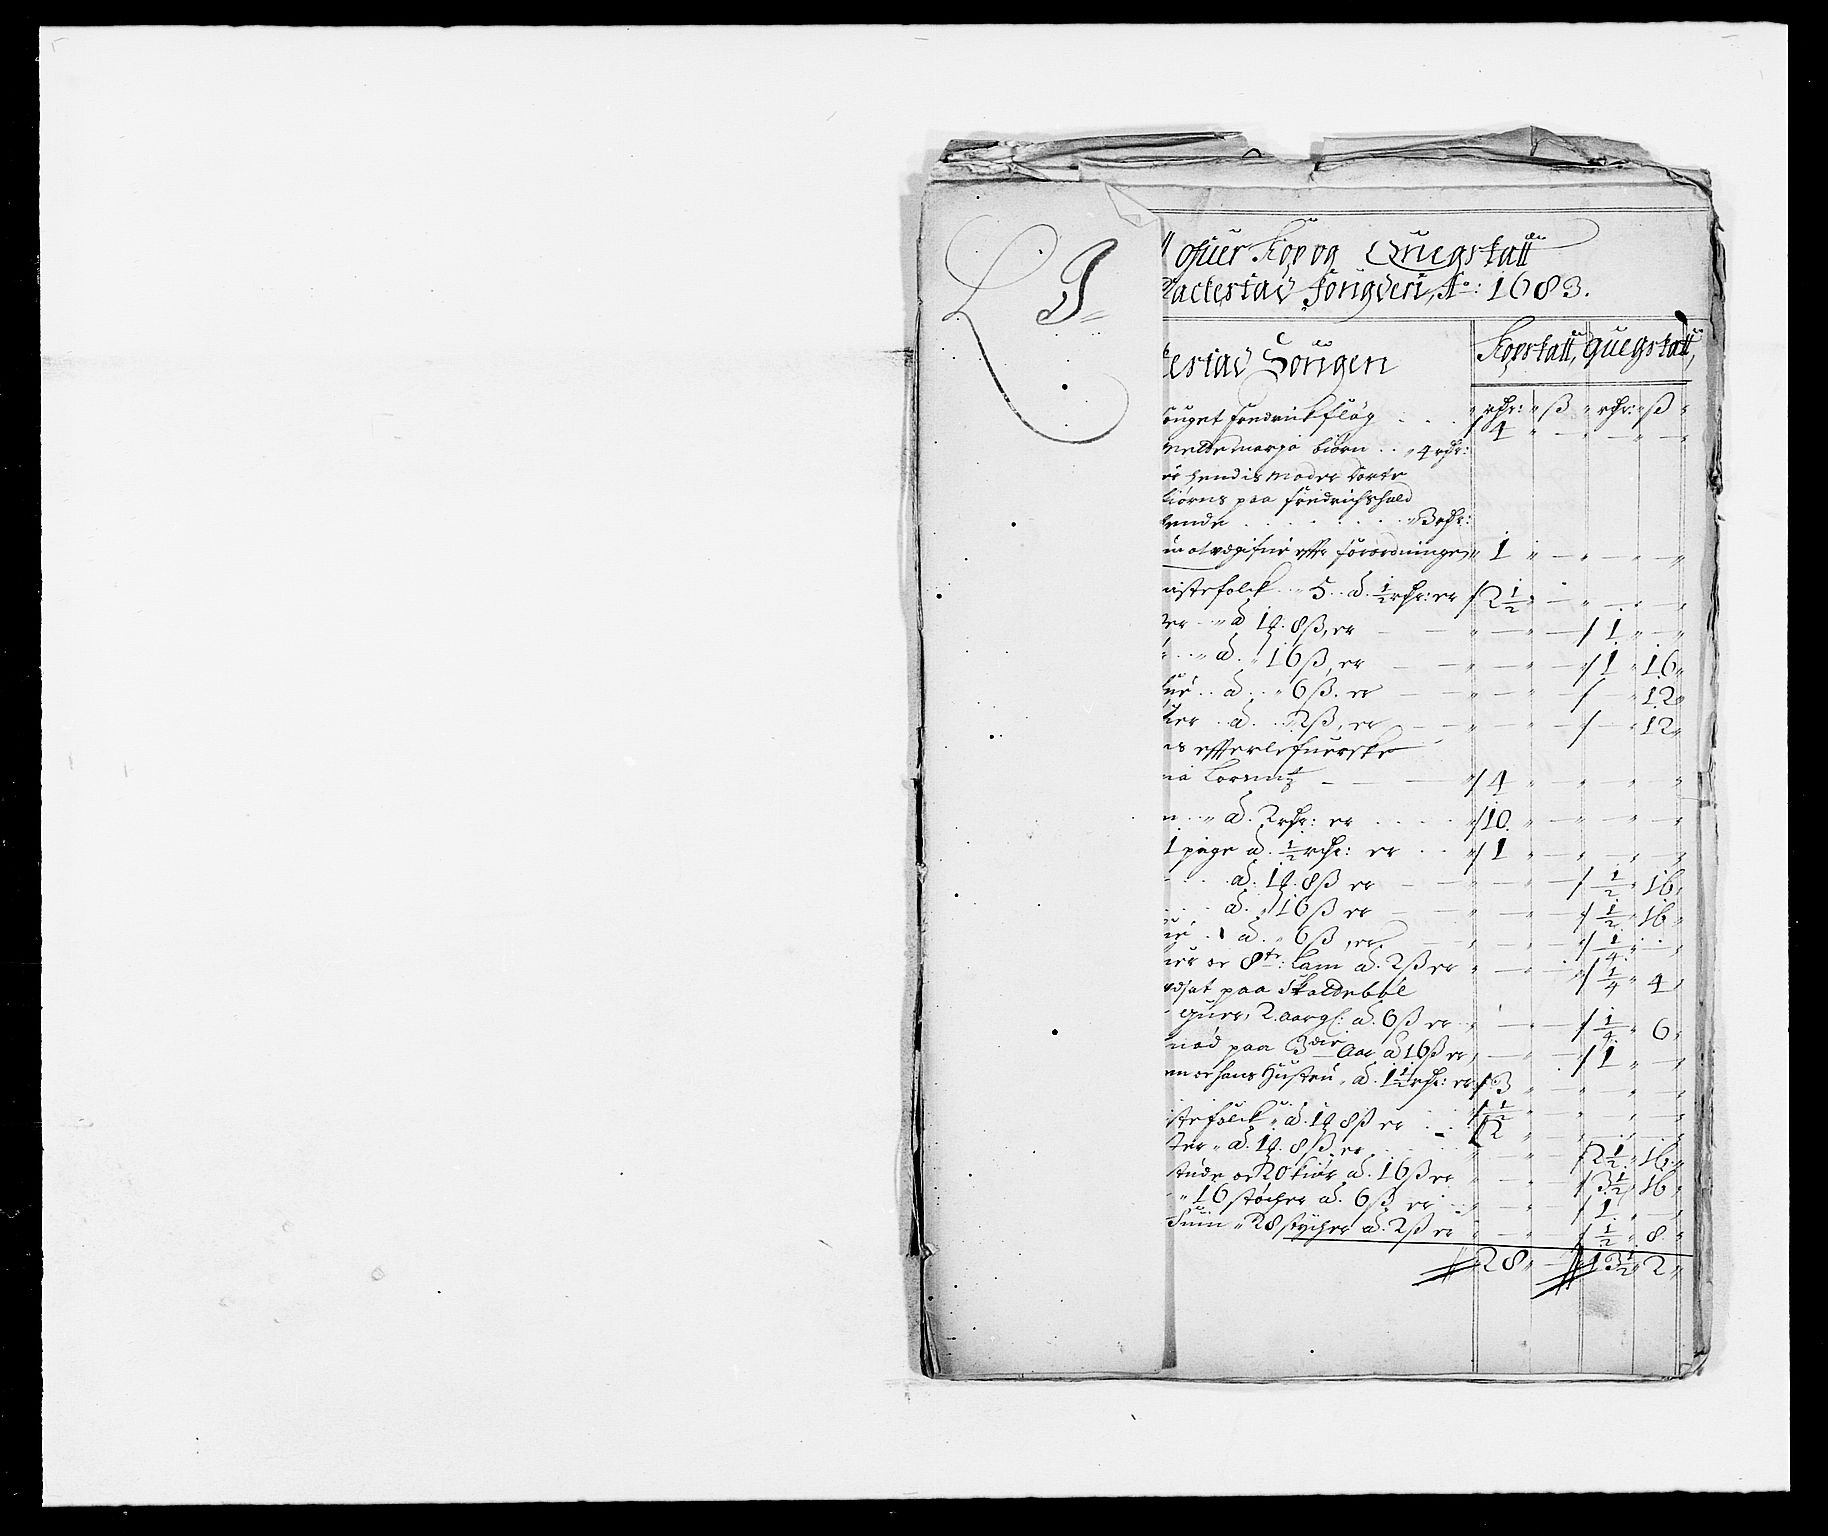 RA, Rentekammeret inntil 1814, Reviderte regnskaper, Fogderegnskap, R05/L0274: Fogderegnskap Rakkestad, 1683-1684, s. 193